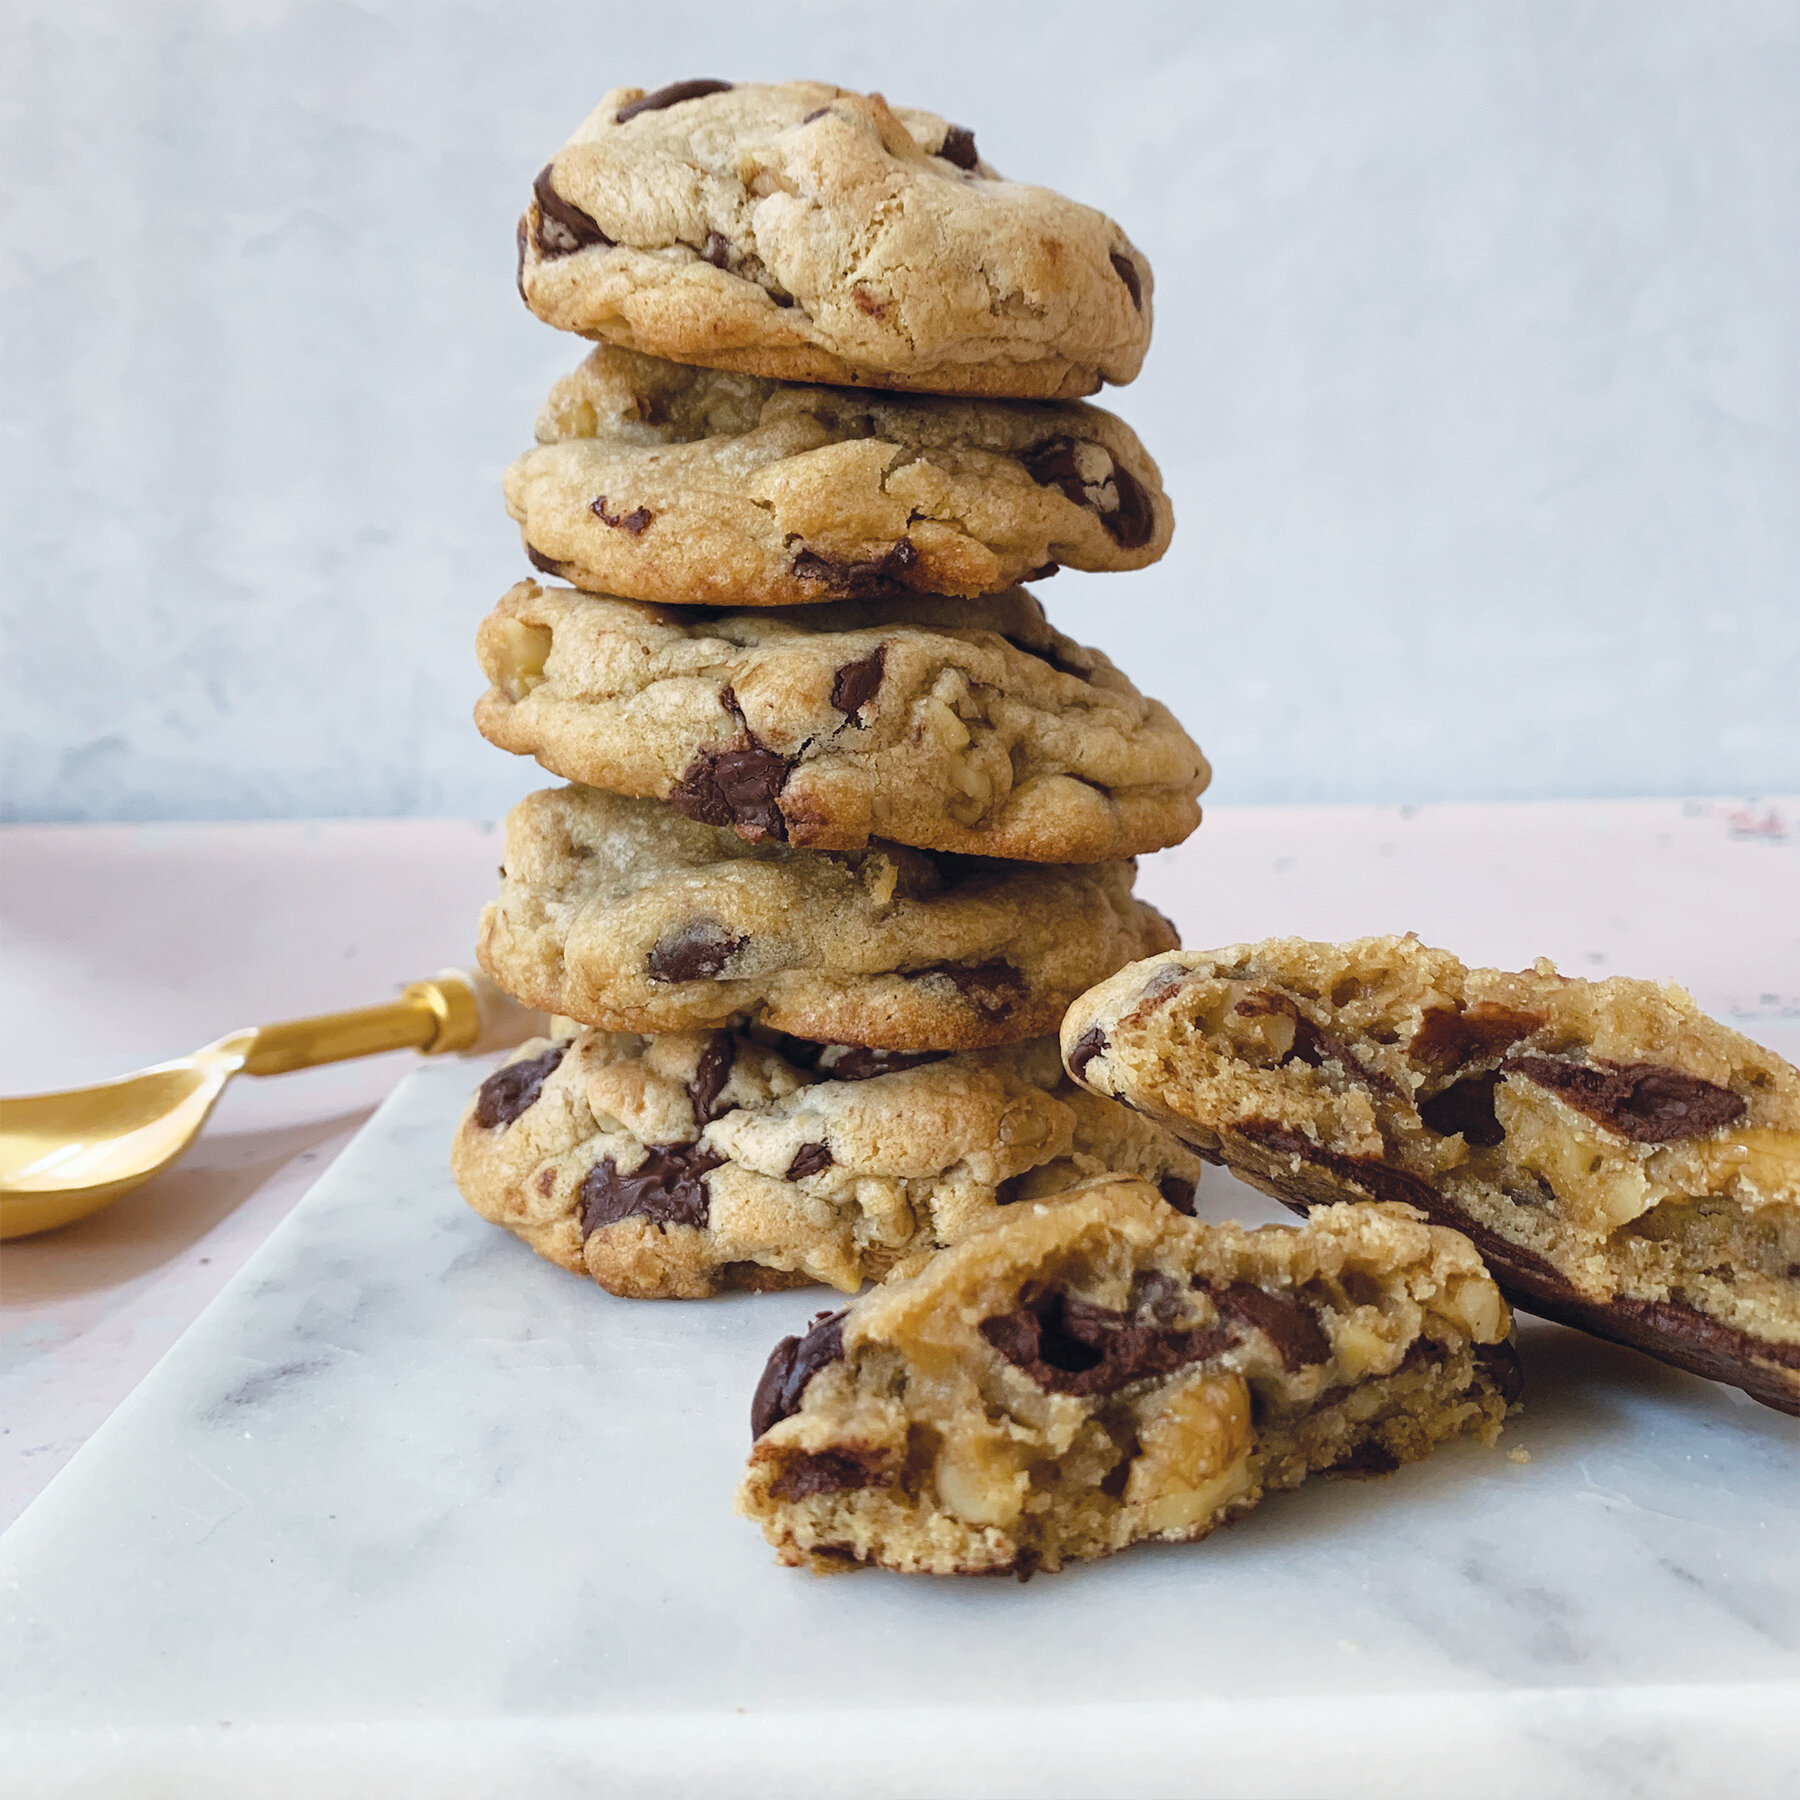 Chocolate Chip Nut Cookies